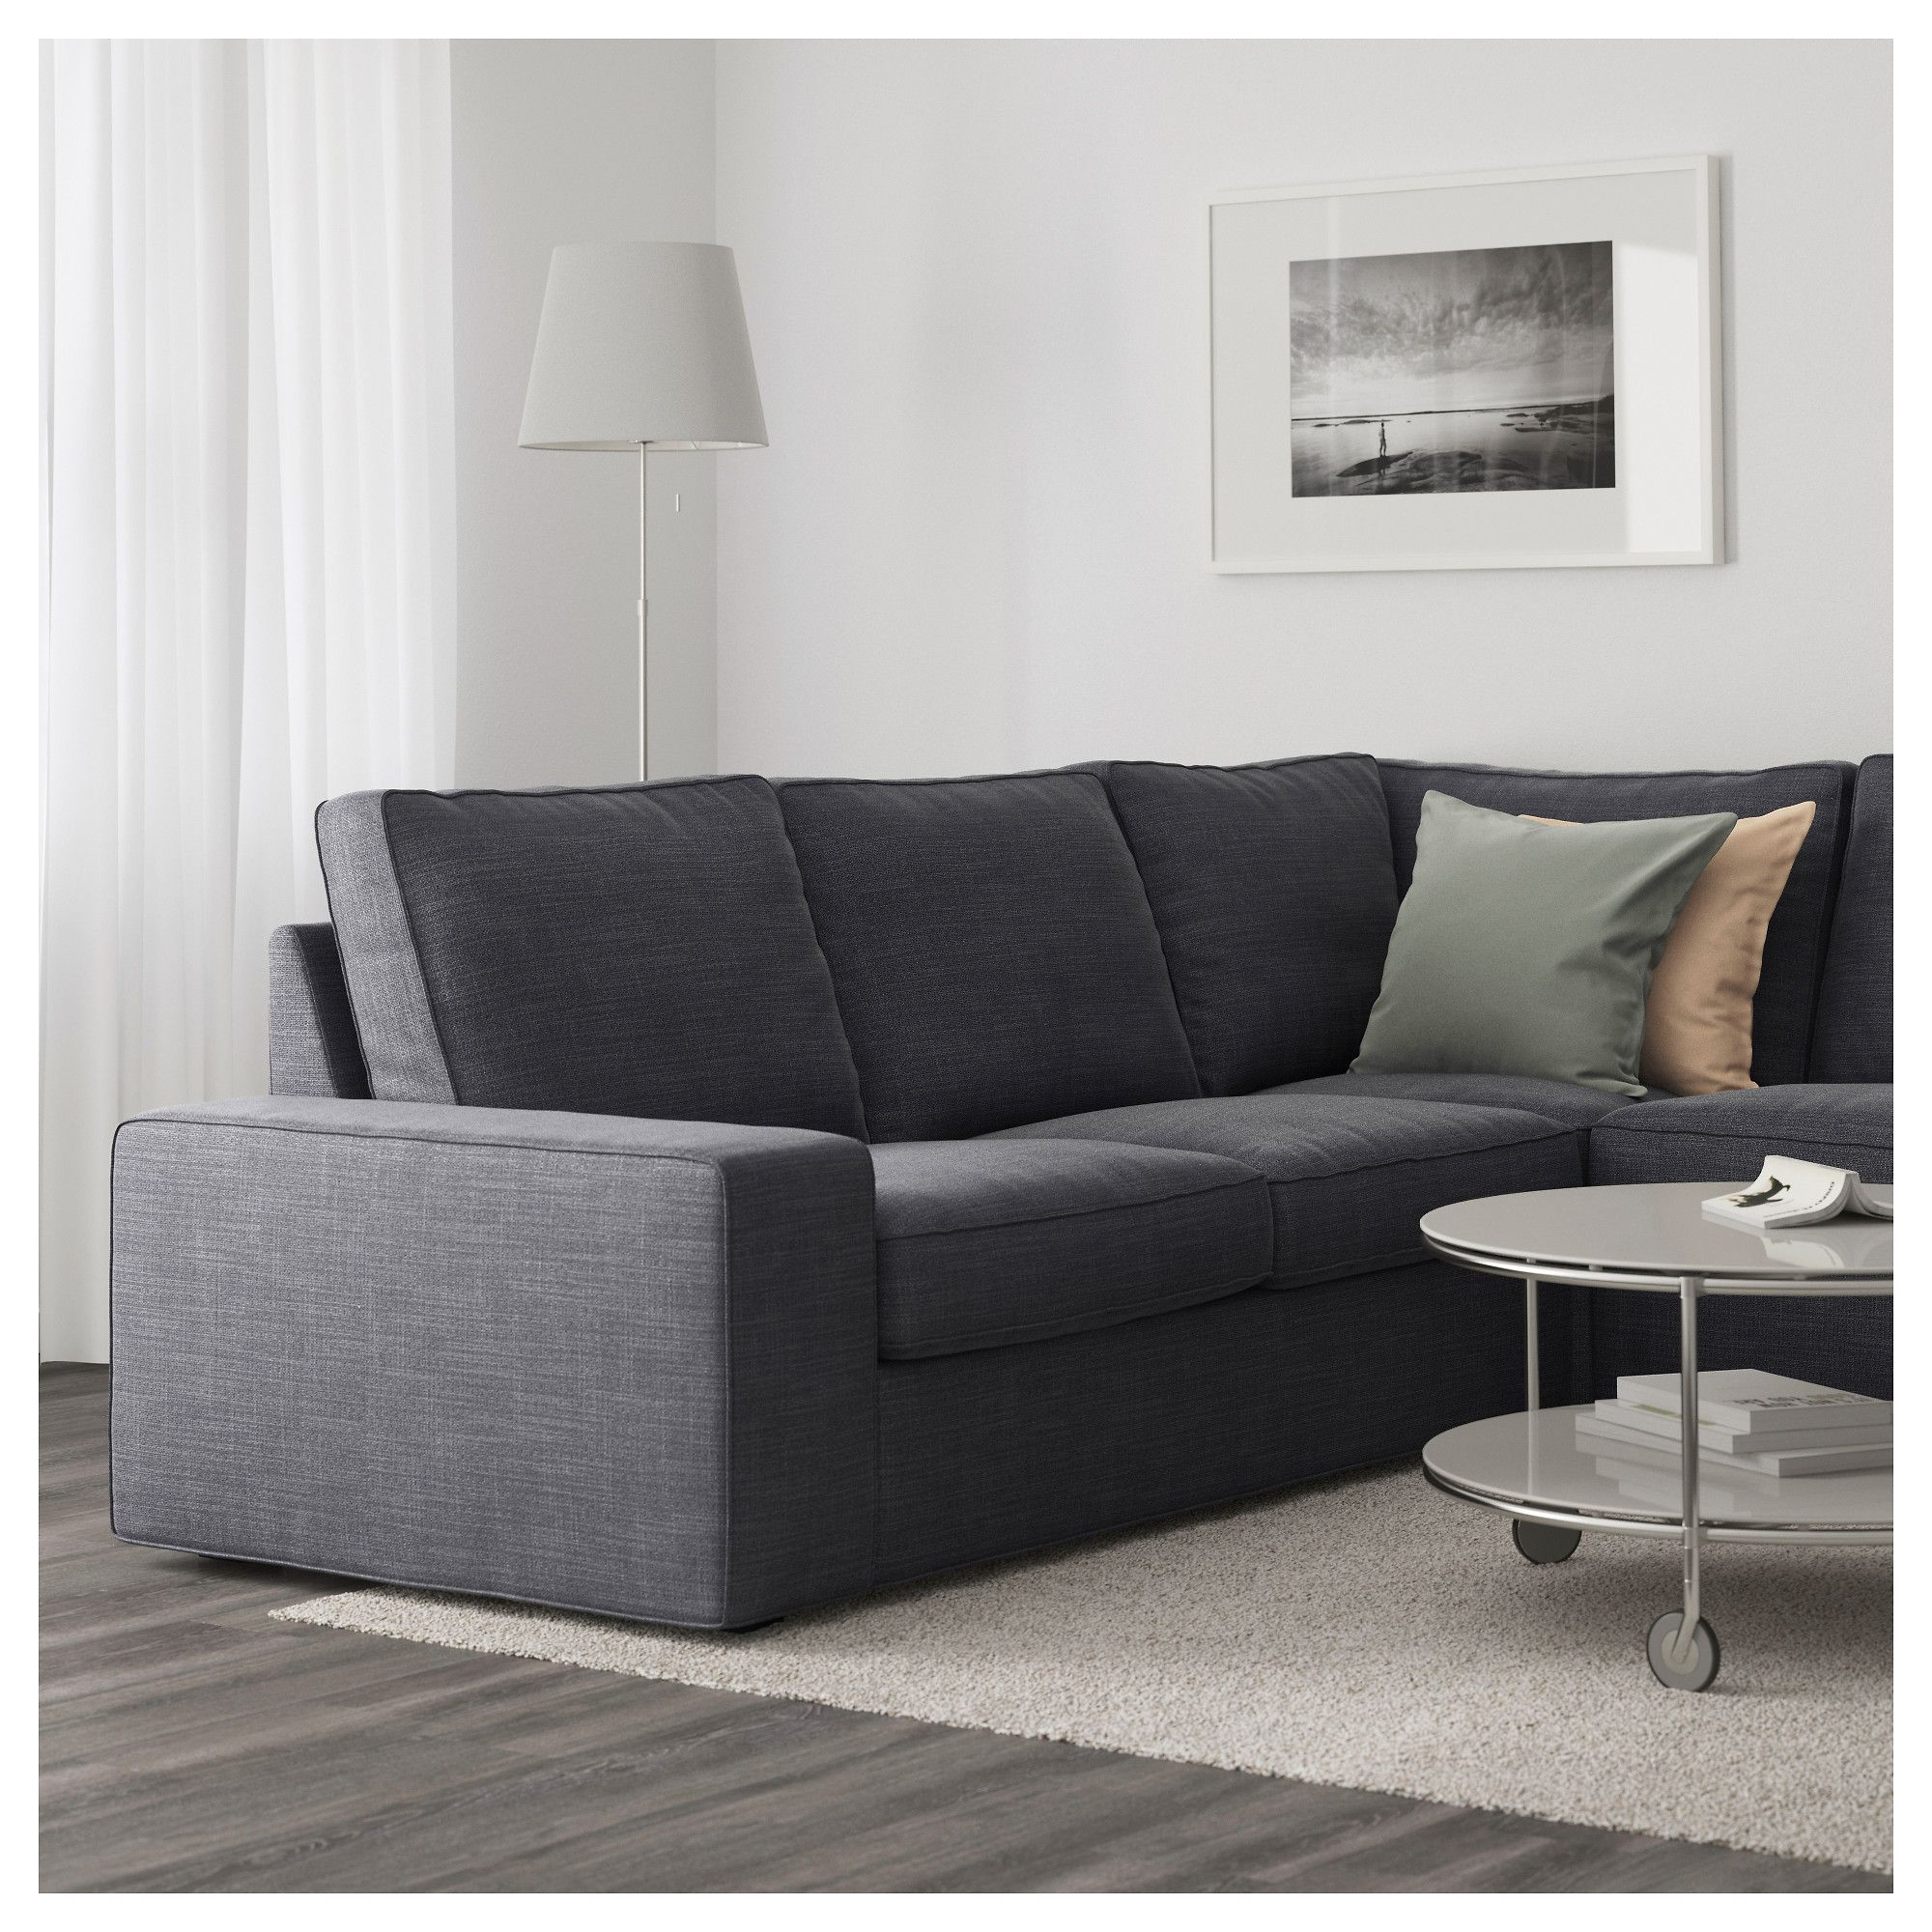 Furniture and Home Furnishings Ikea sectional, Corner